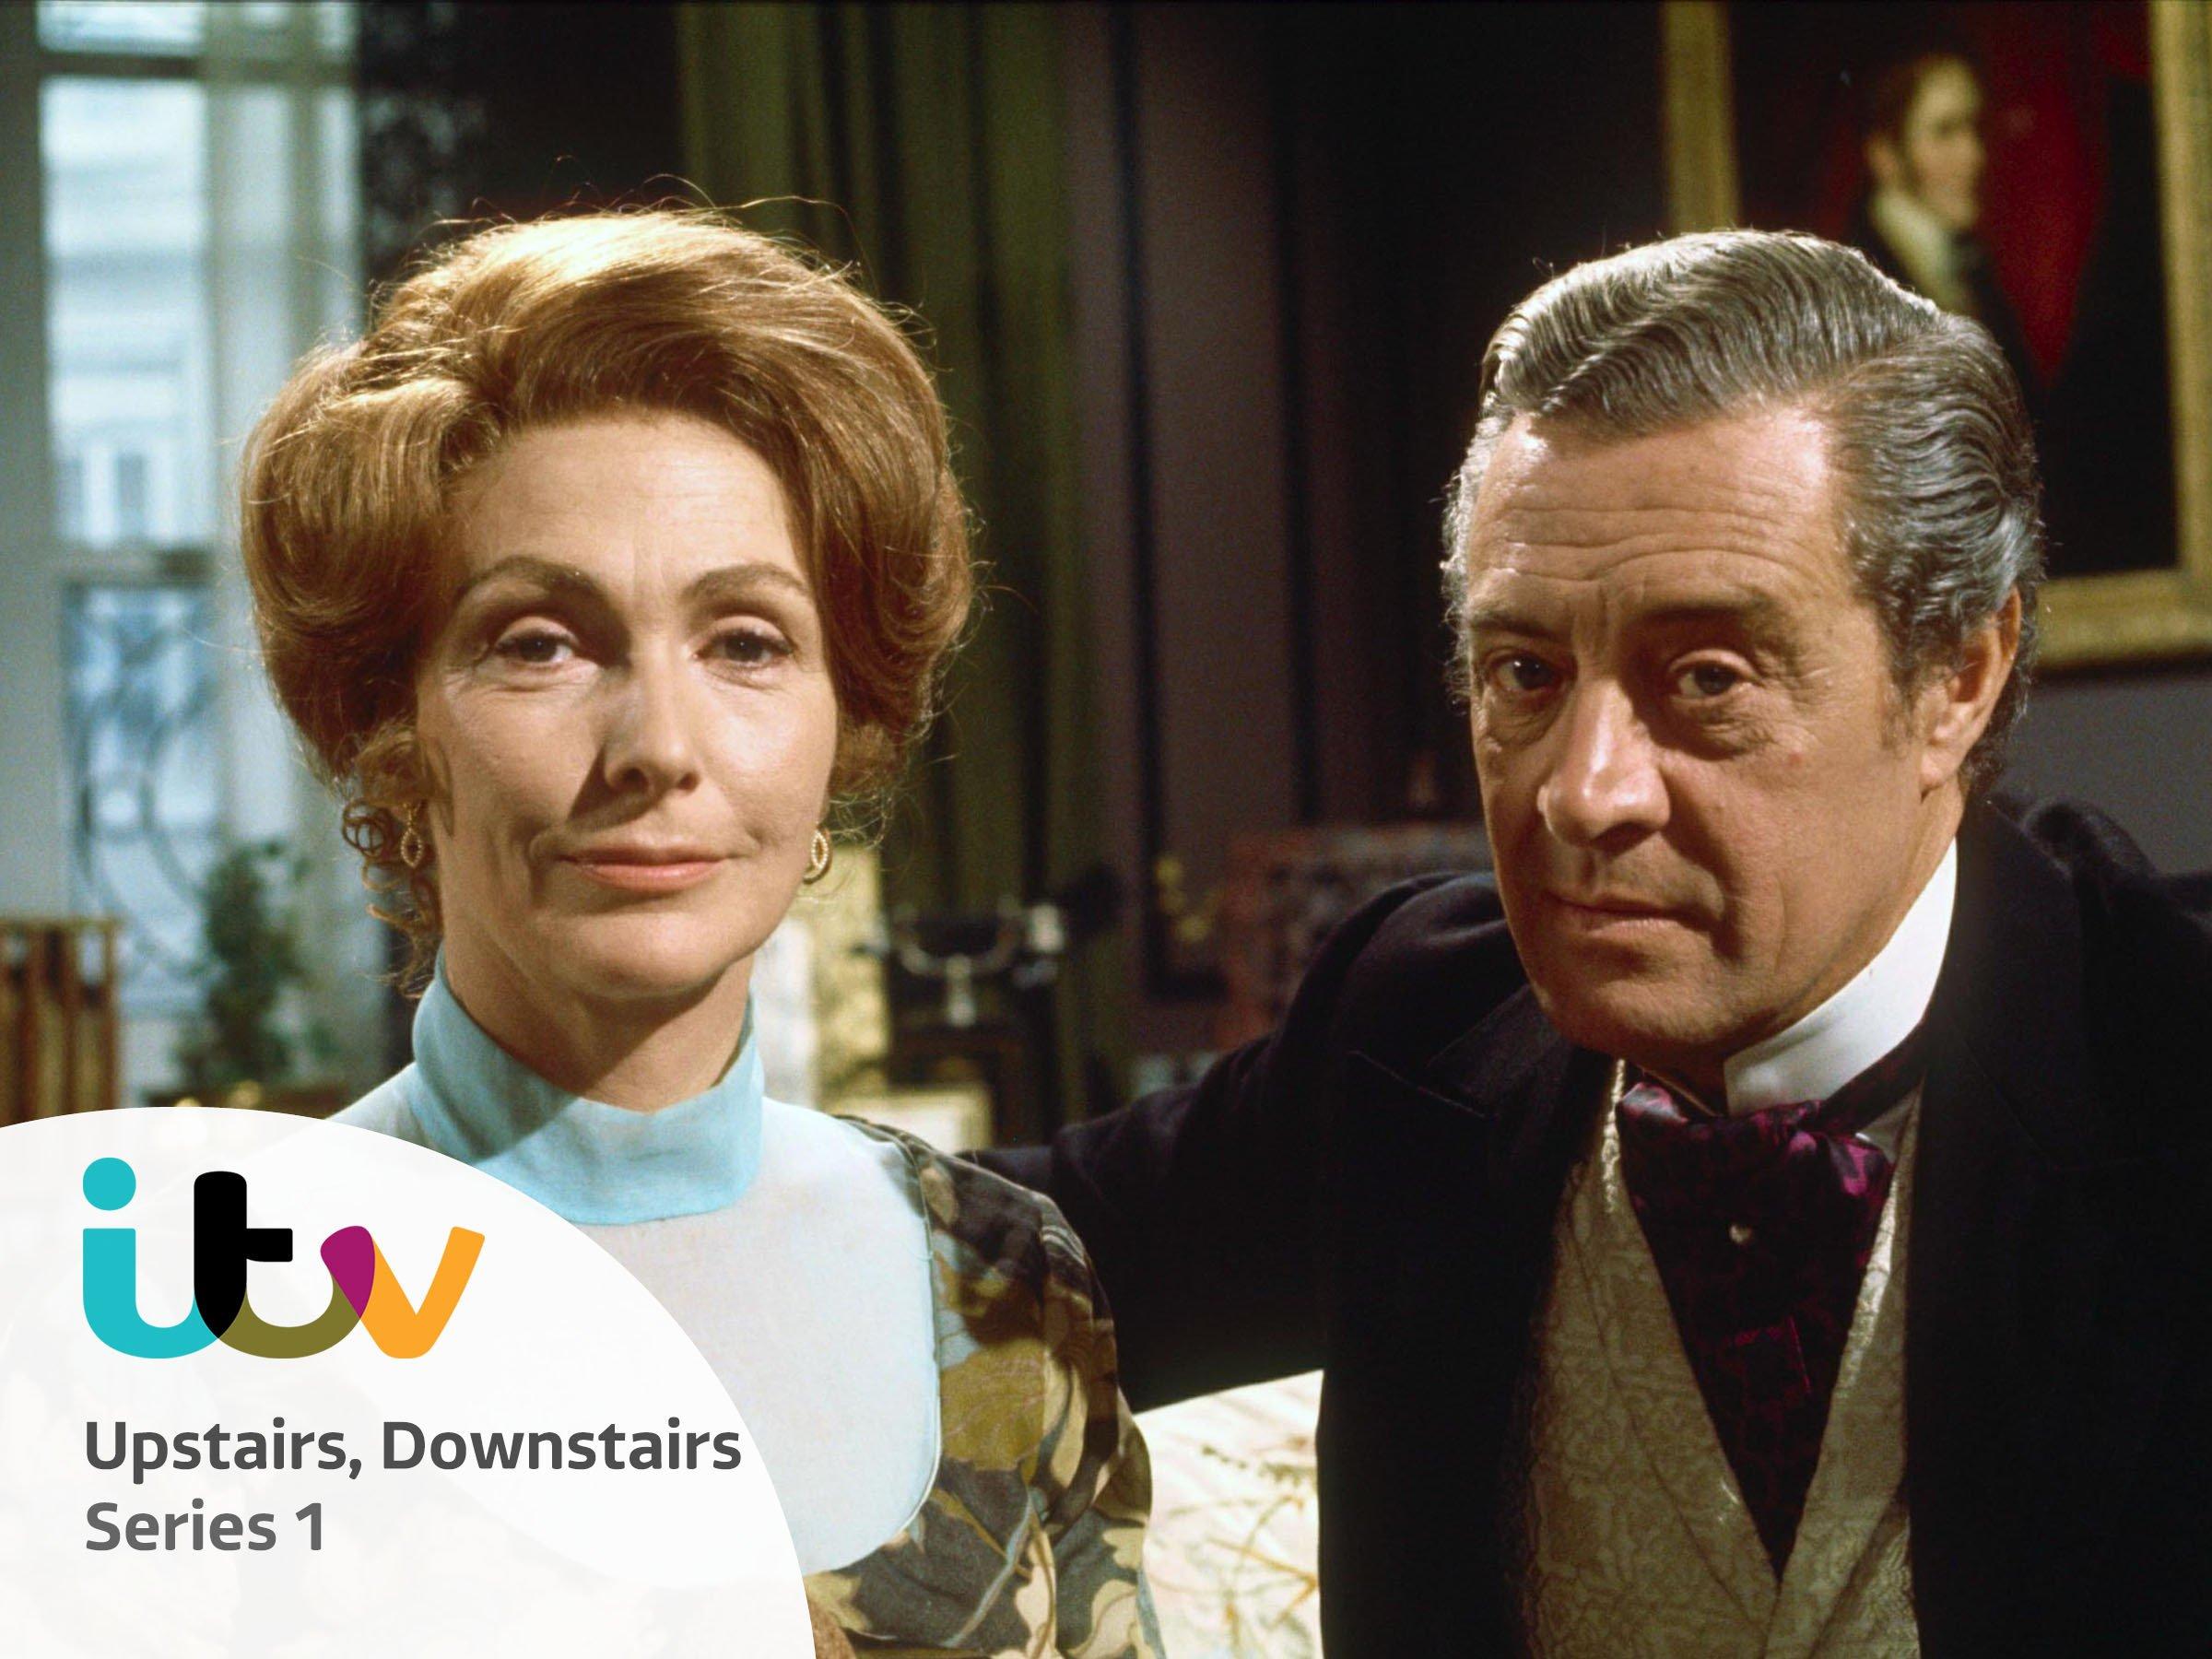 watch upstairs downstairs 2010 season 2 episode 2